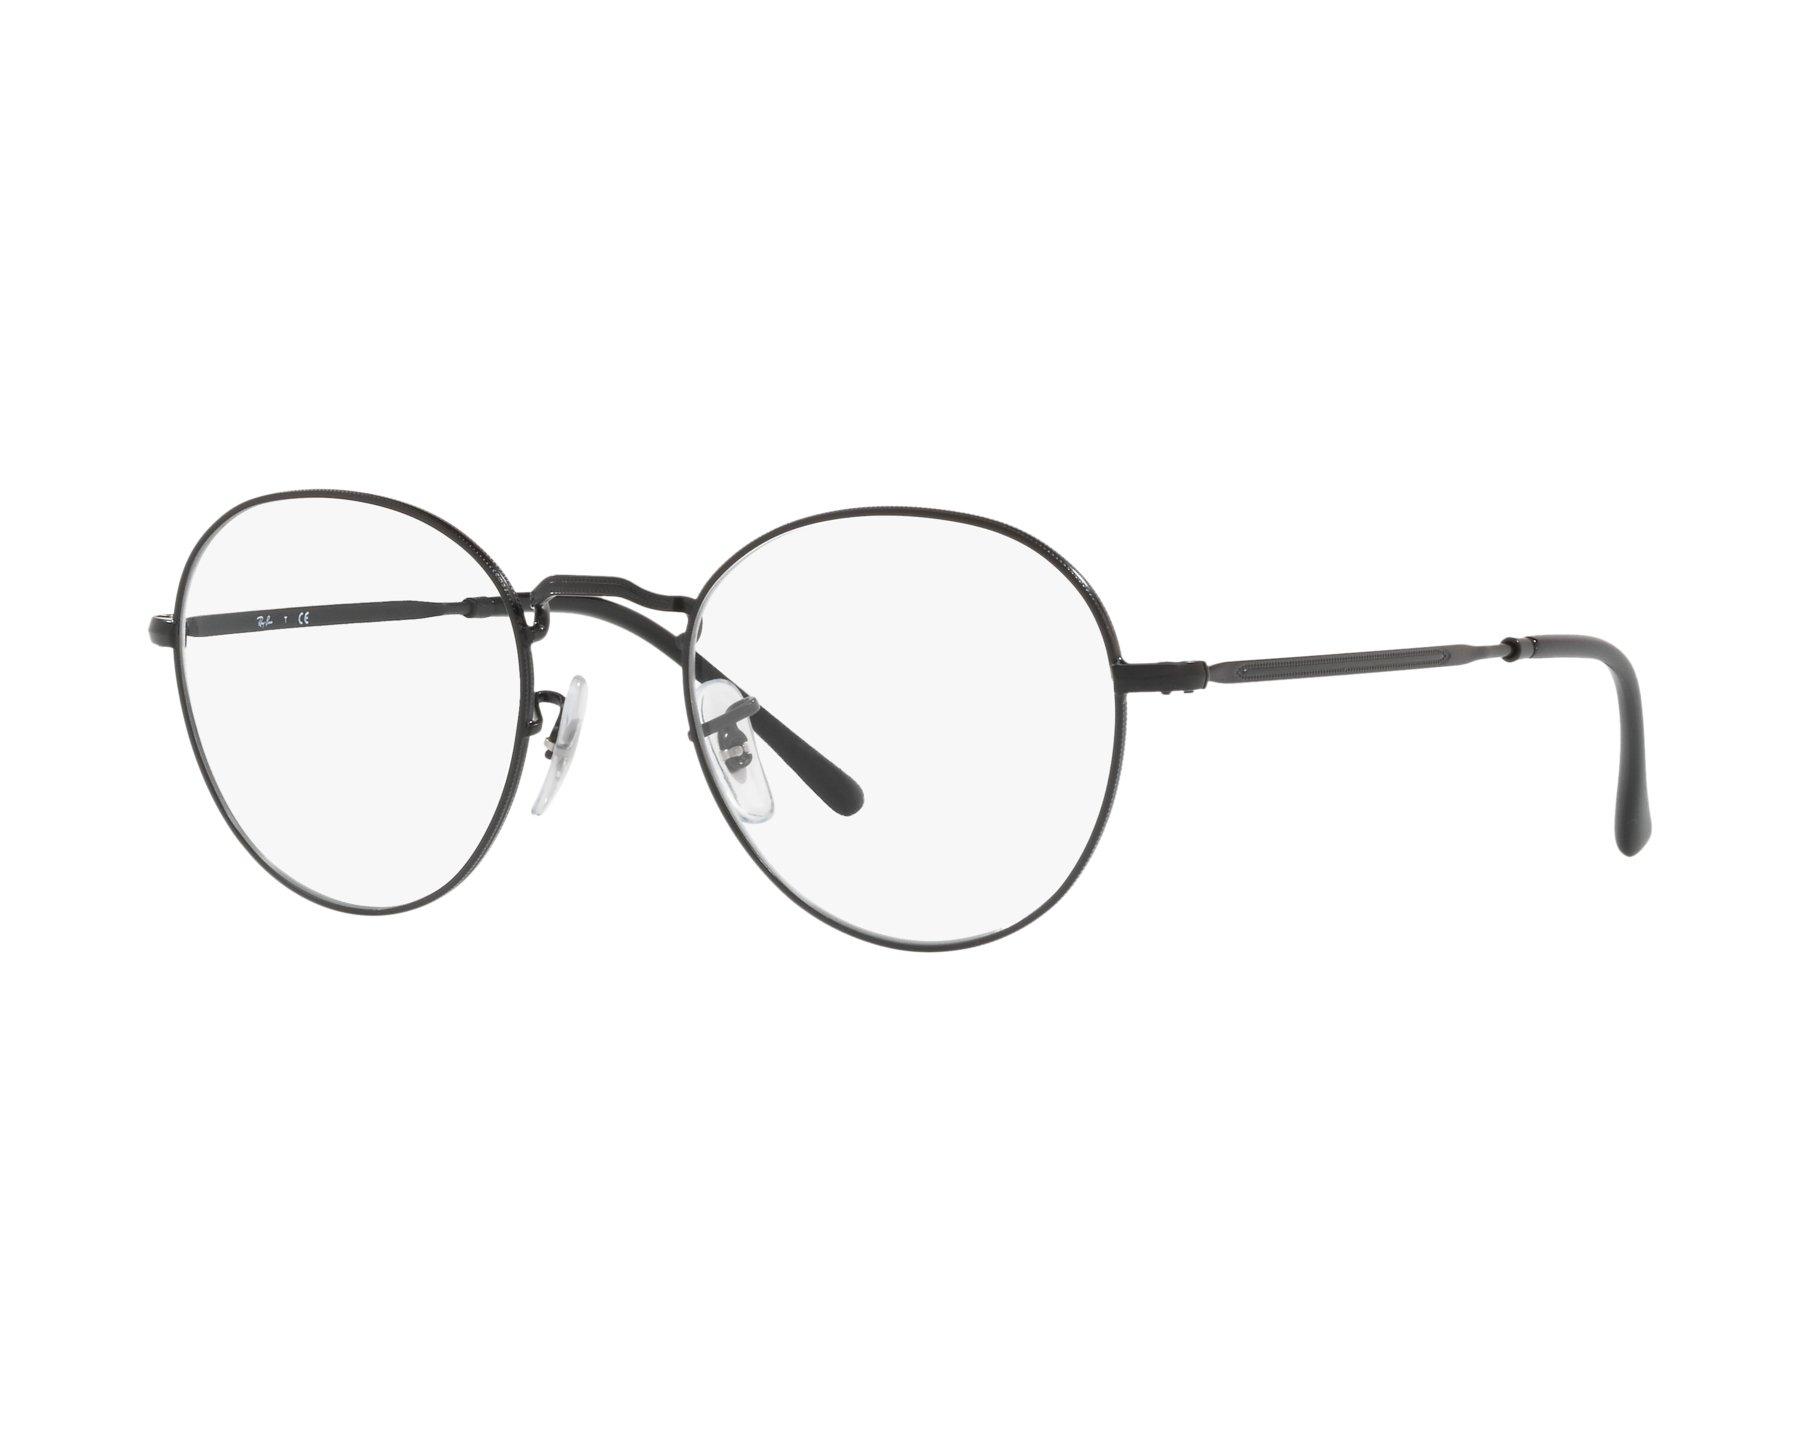 038d1043a2 eyeglasses Ray-Ban RX-3582-V 2760 49-20 Black